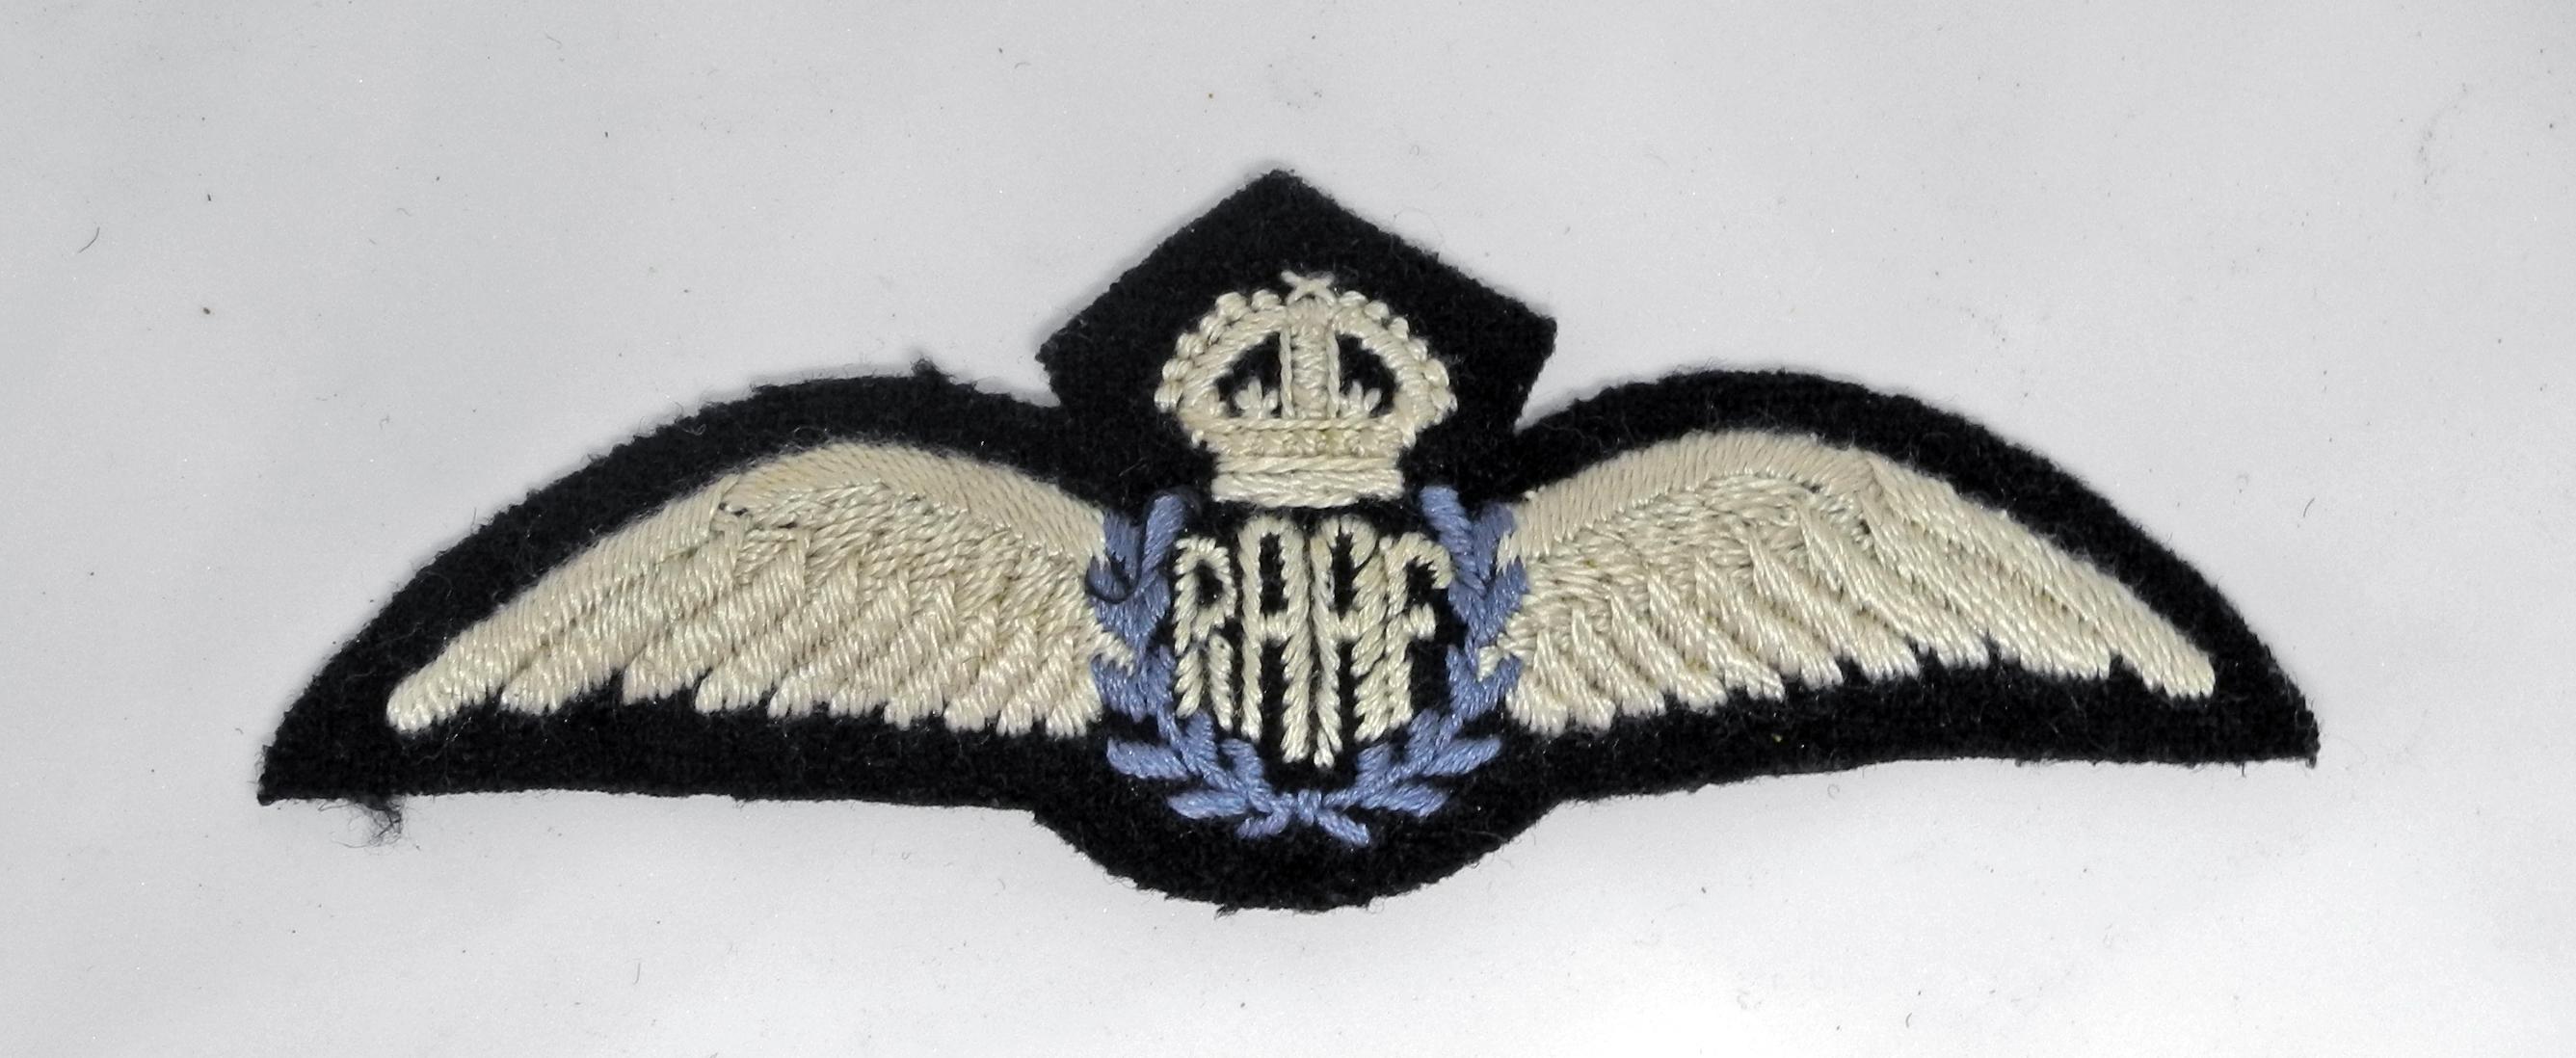 RAAF pilot wing